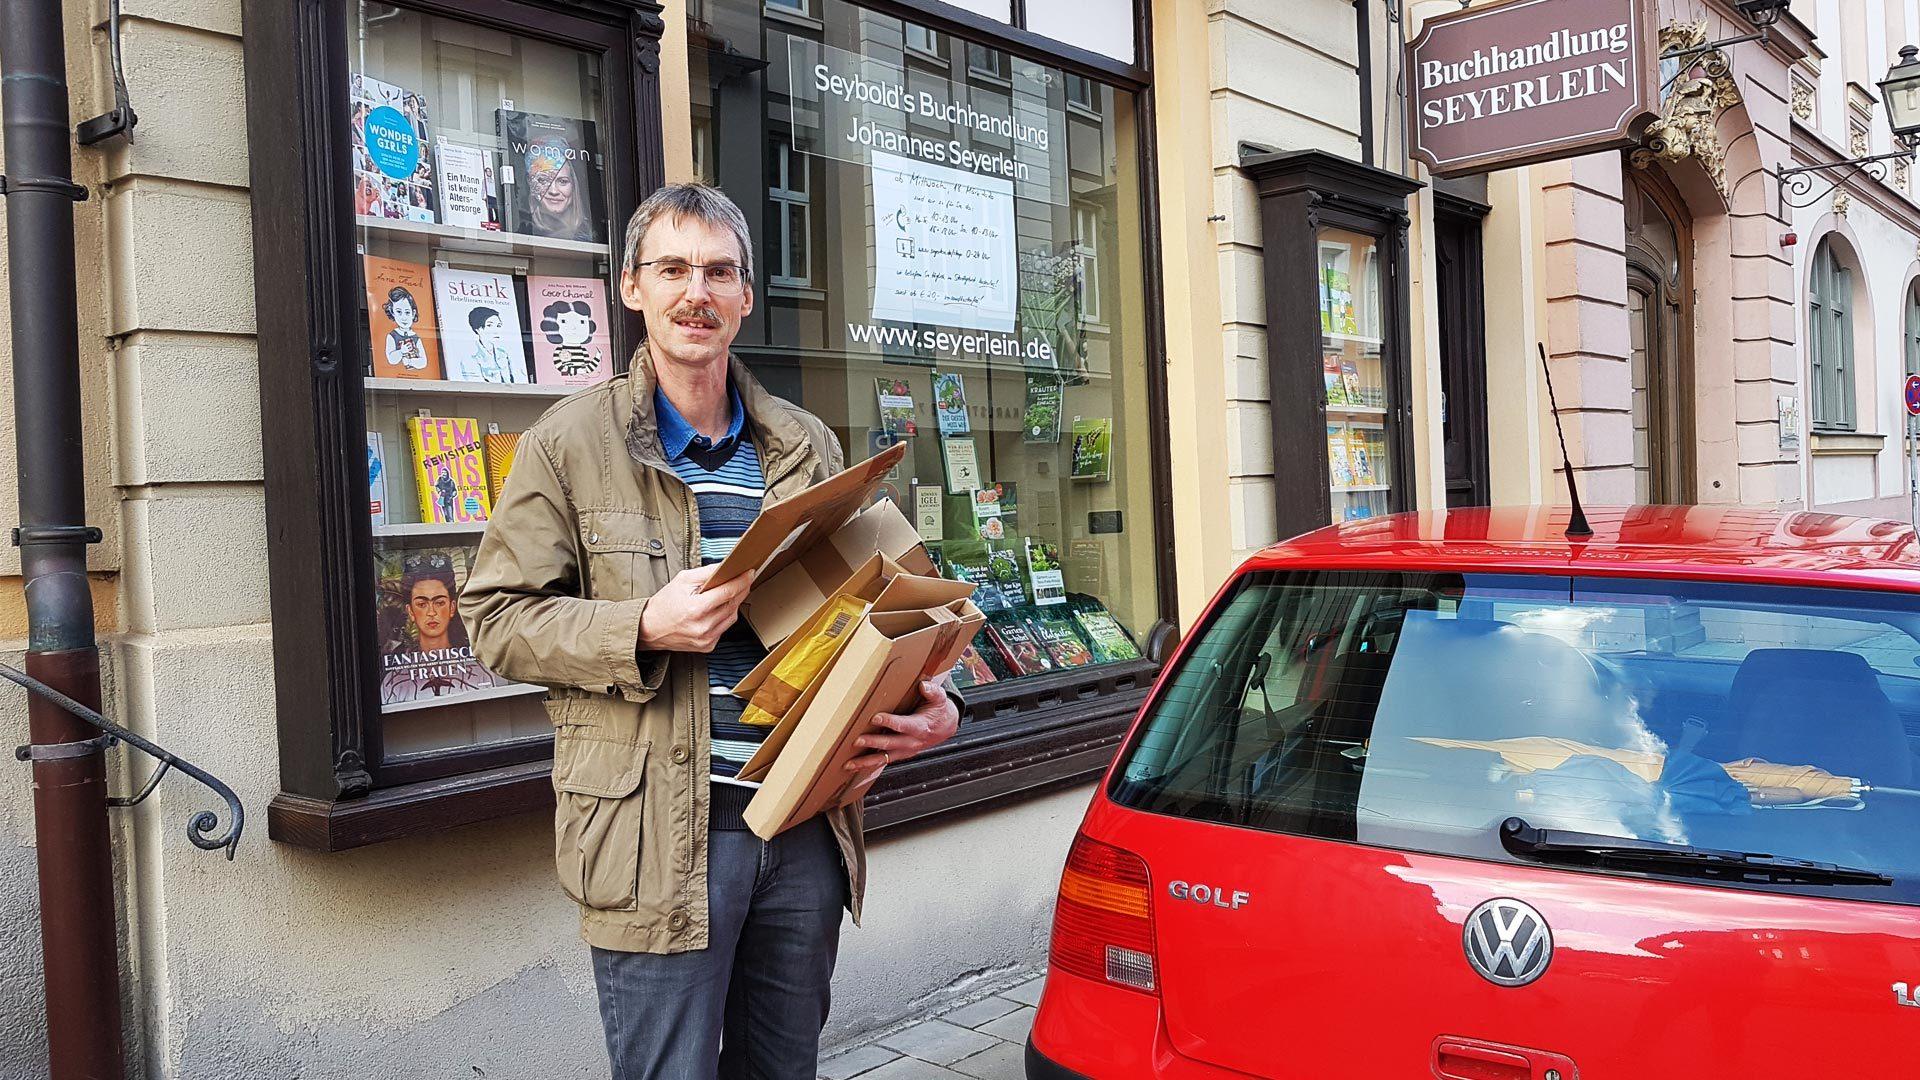 Buchhandlung Seyerlein in Ansbach